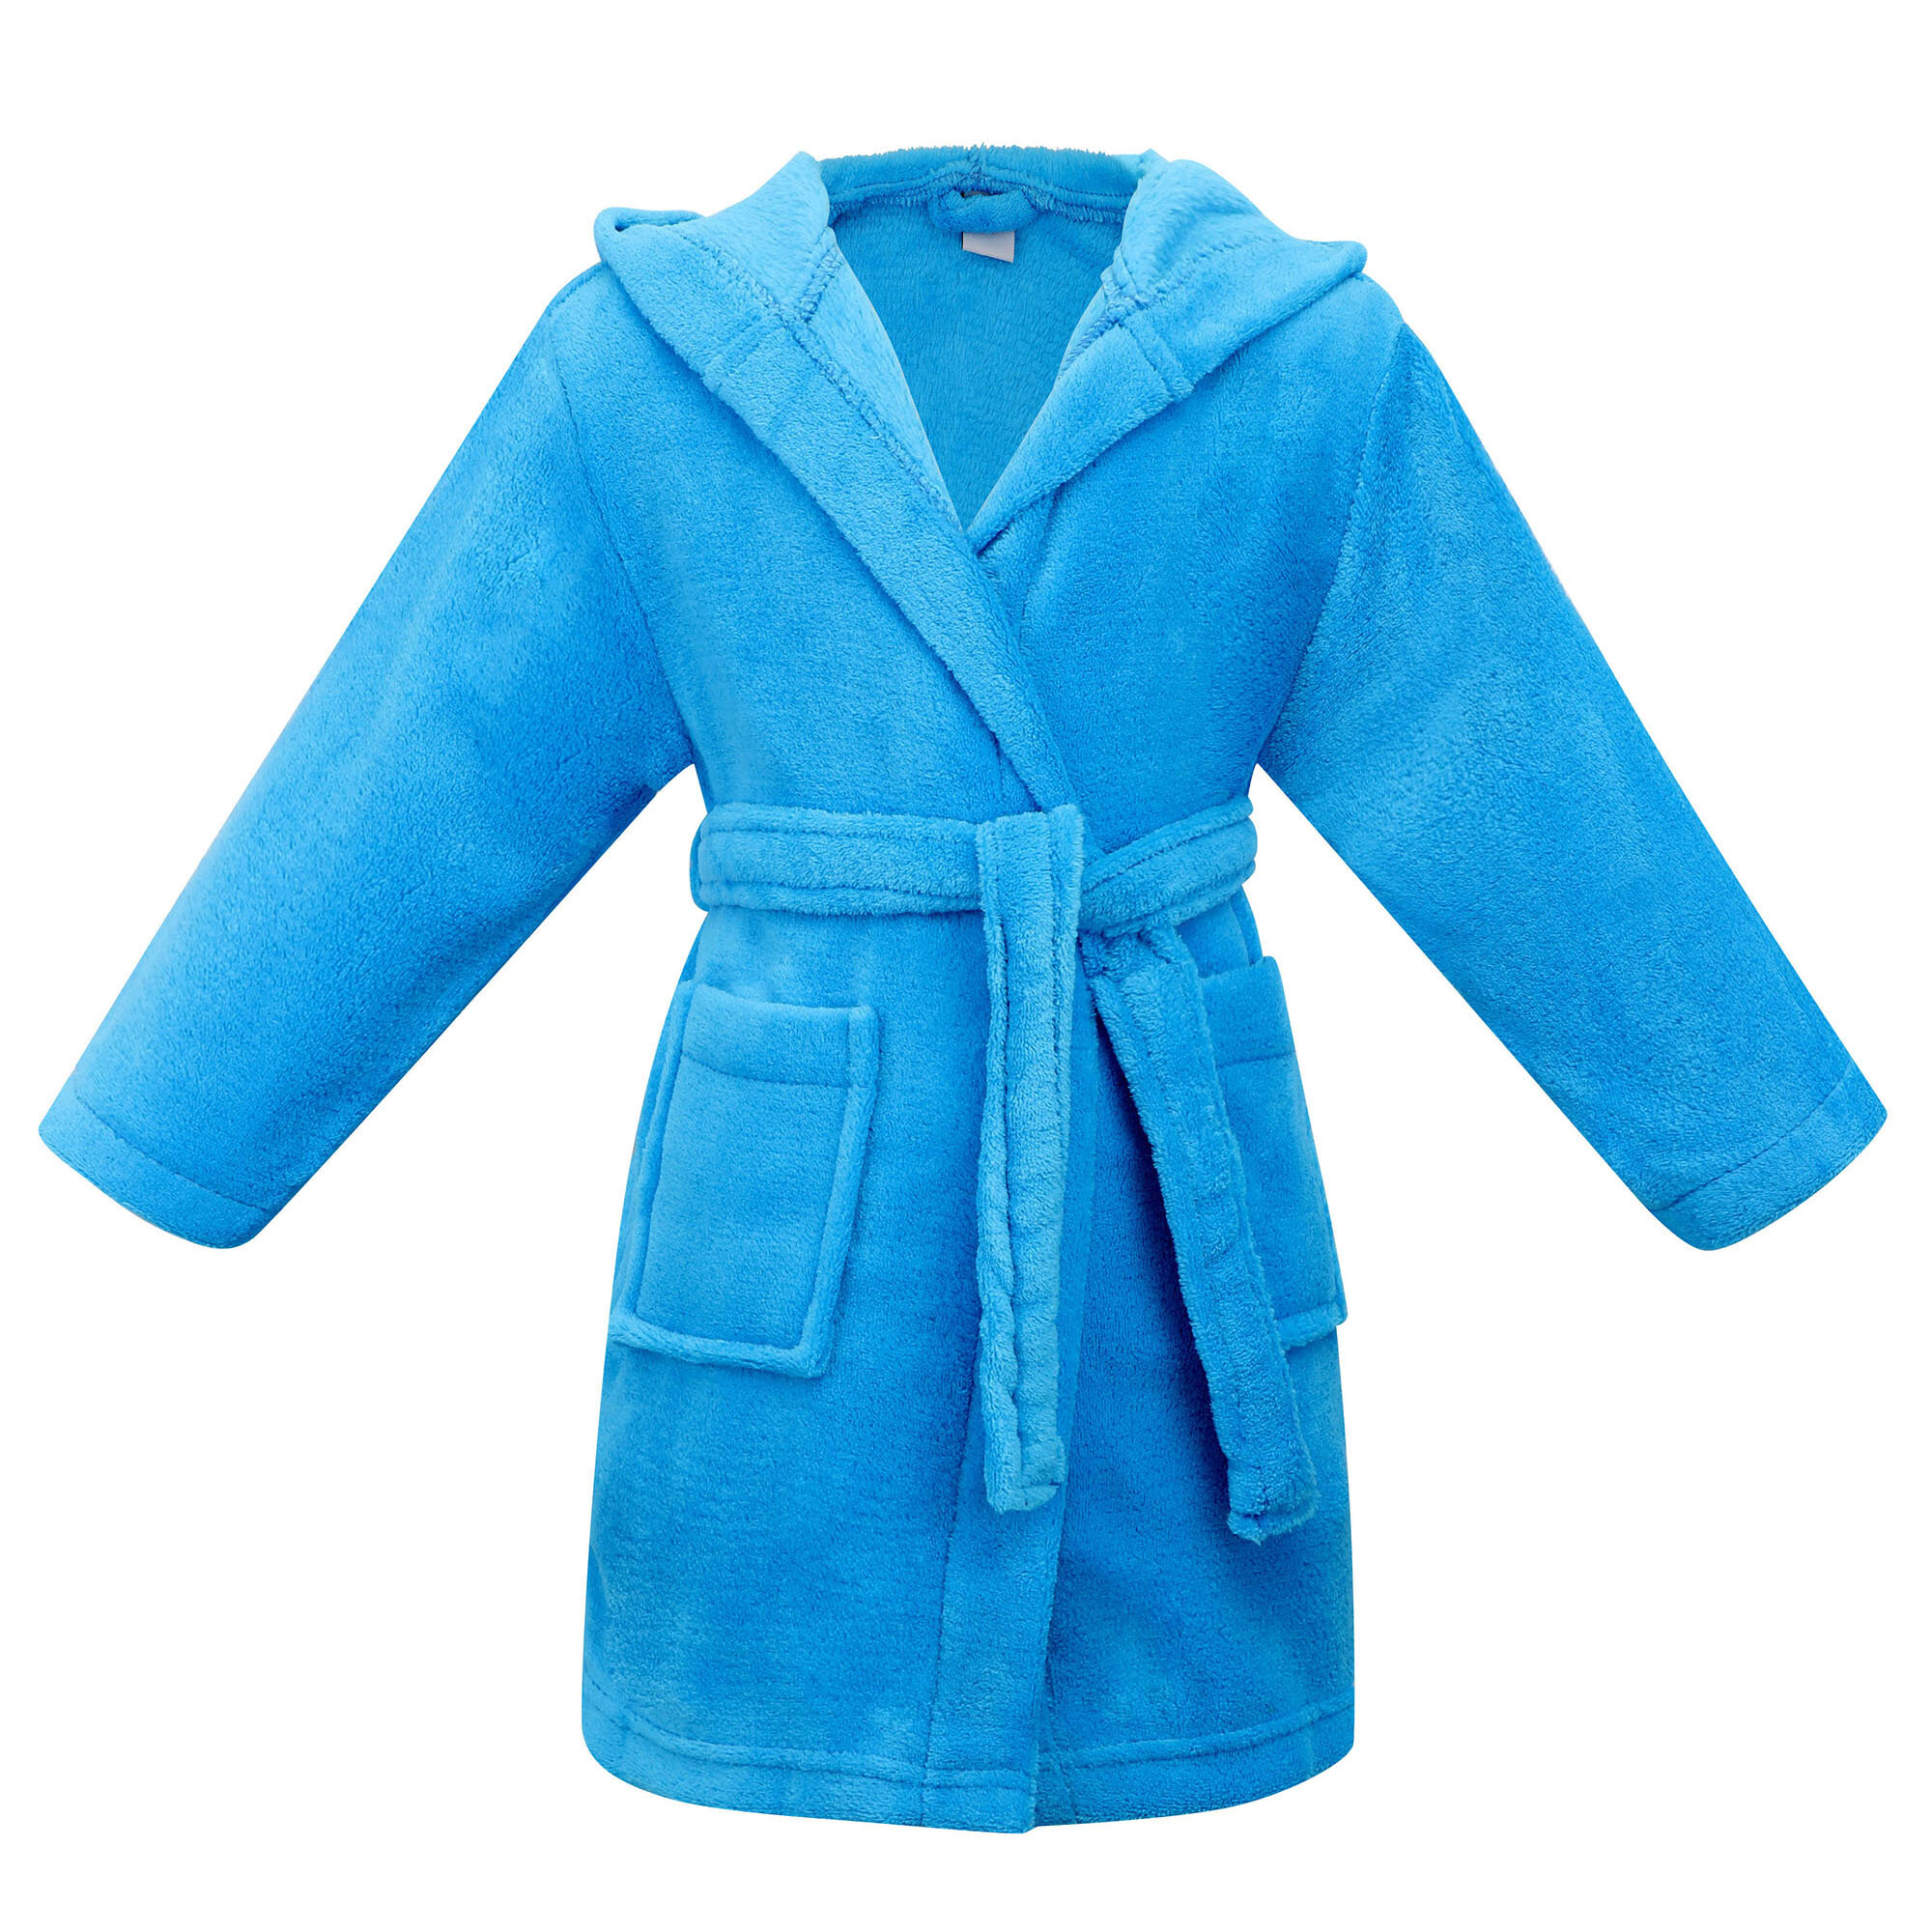 Soft Warm Kids Robe for Boys Plush Feel Bathrobe Cozy 100/% Microfleece